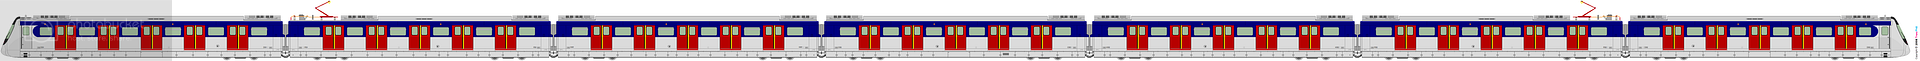 Train 1947